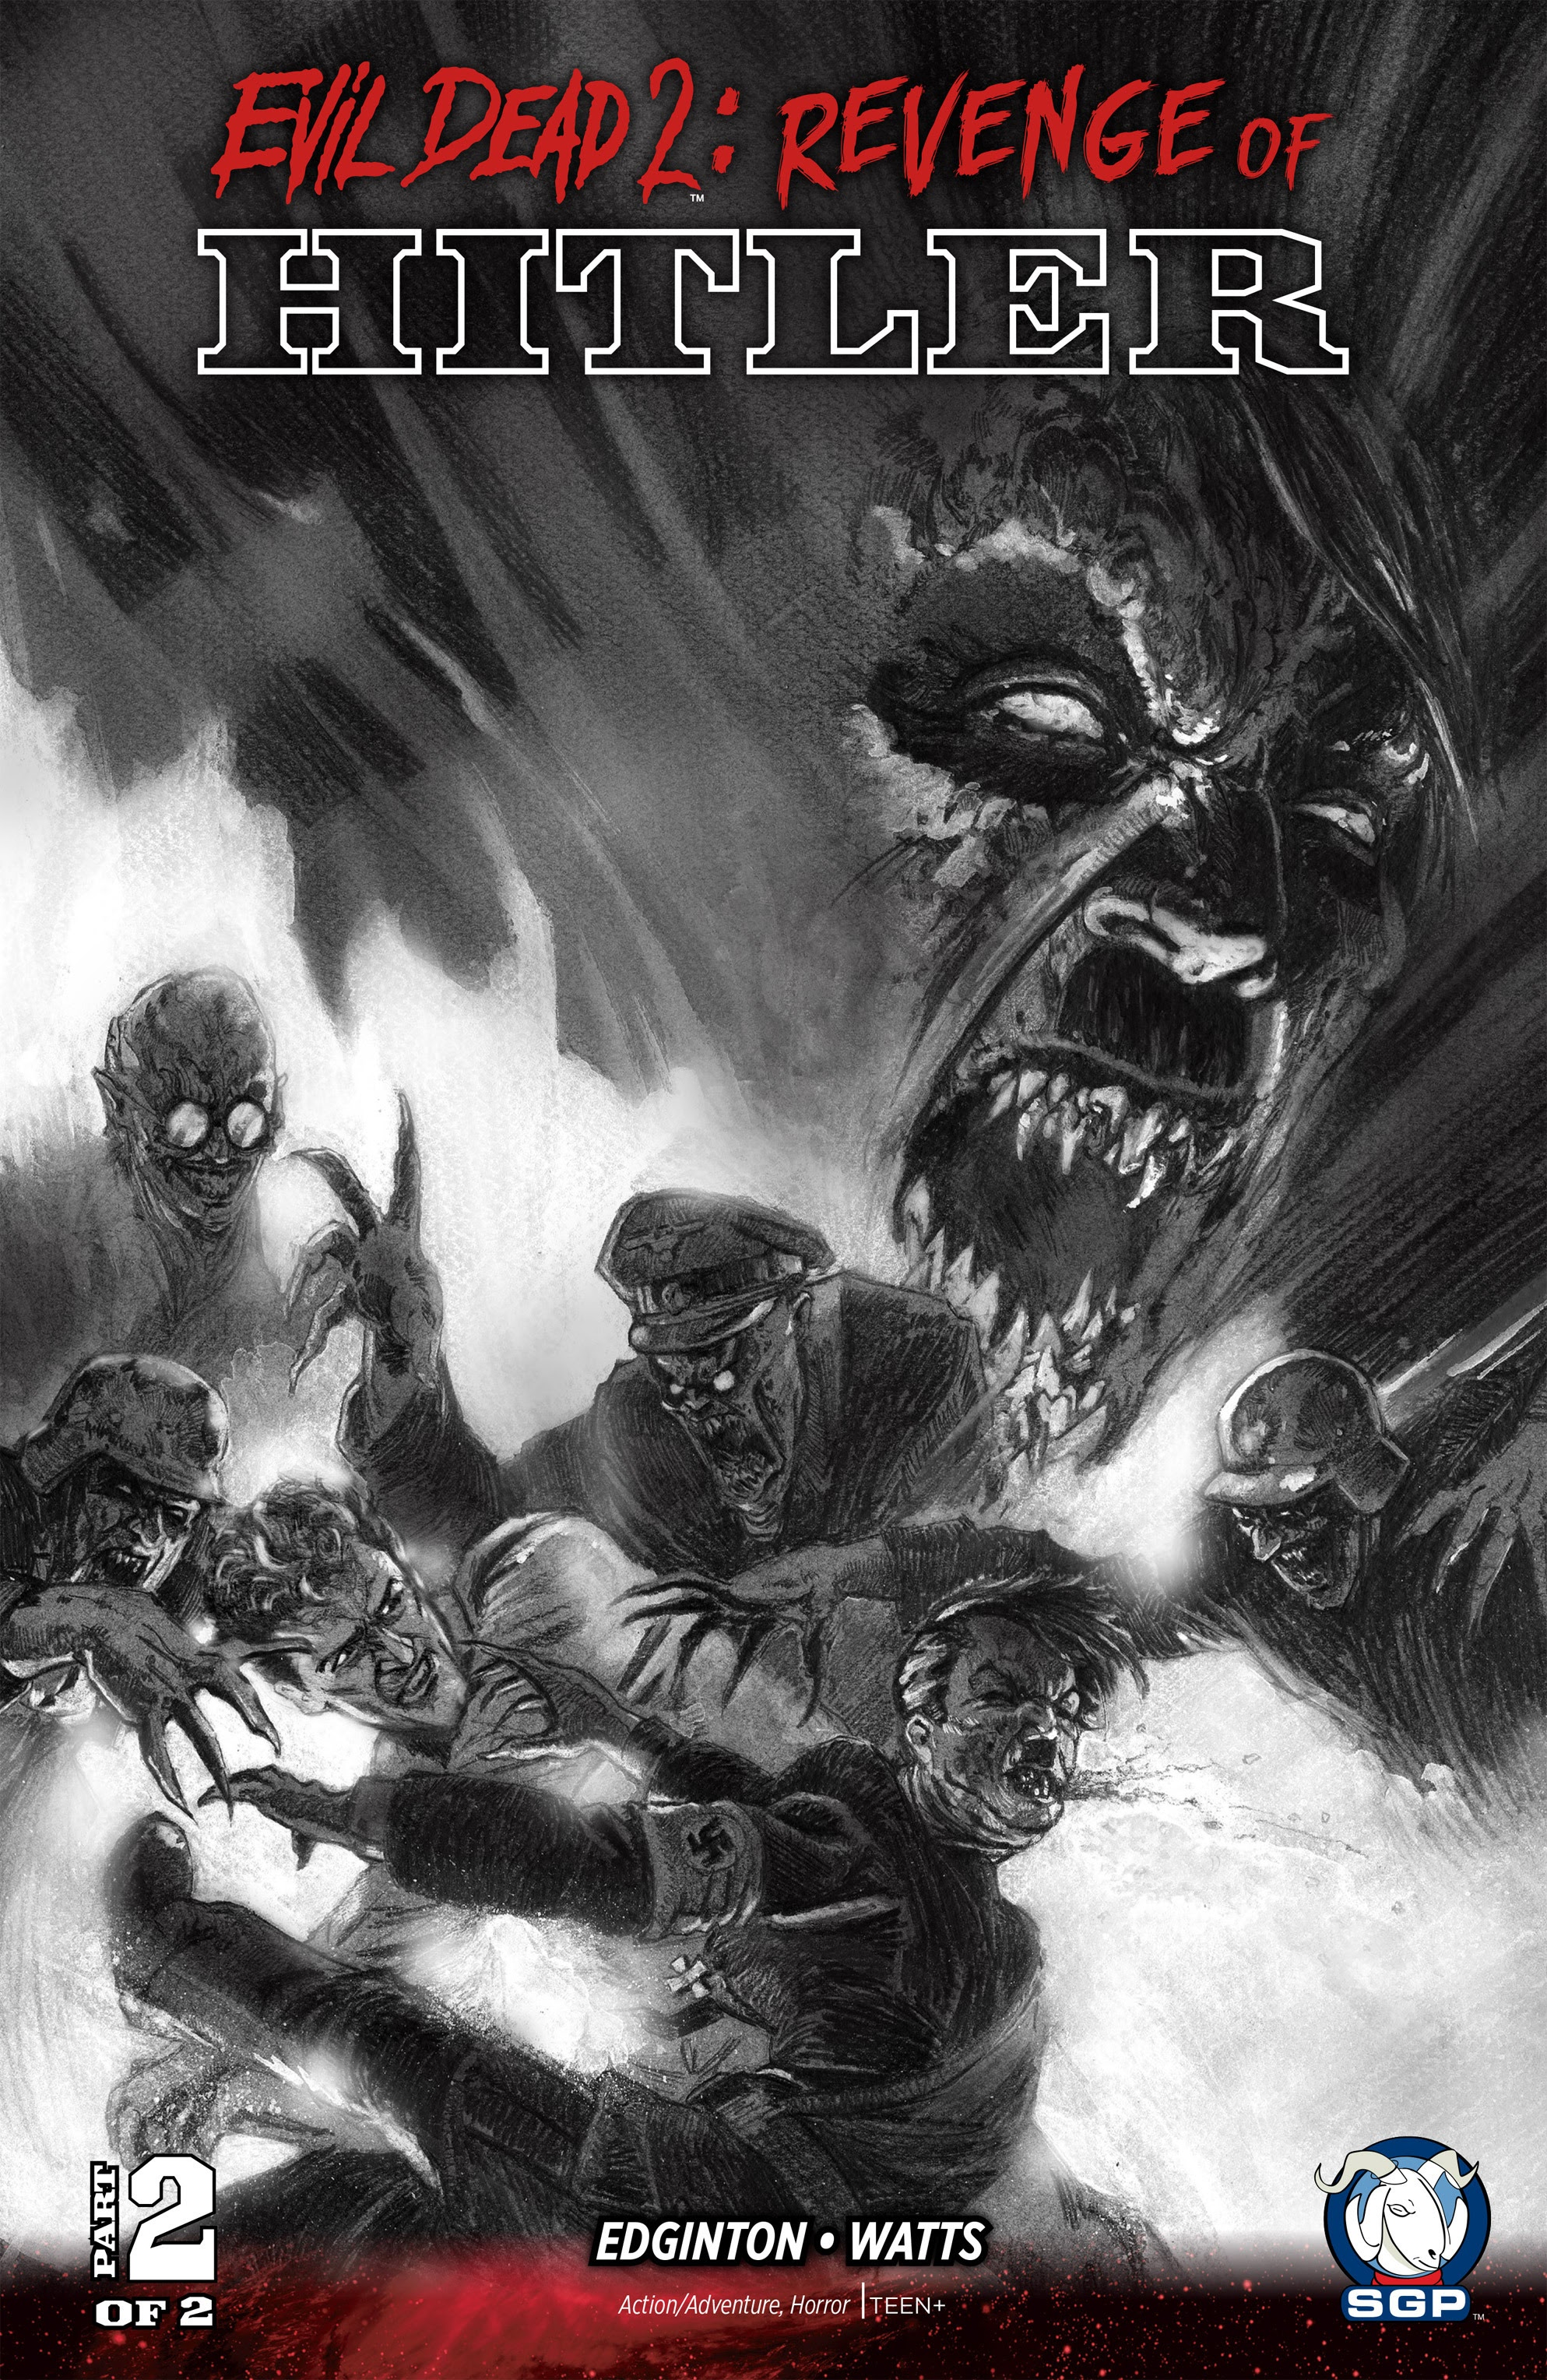 Evil Dead 2: Revenge of Hitler 2 Page 1